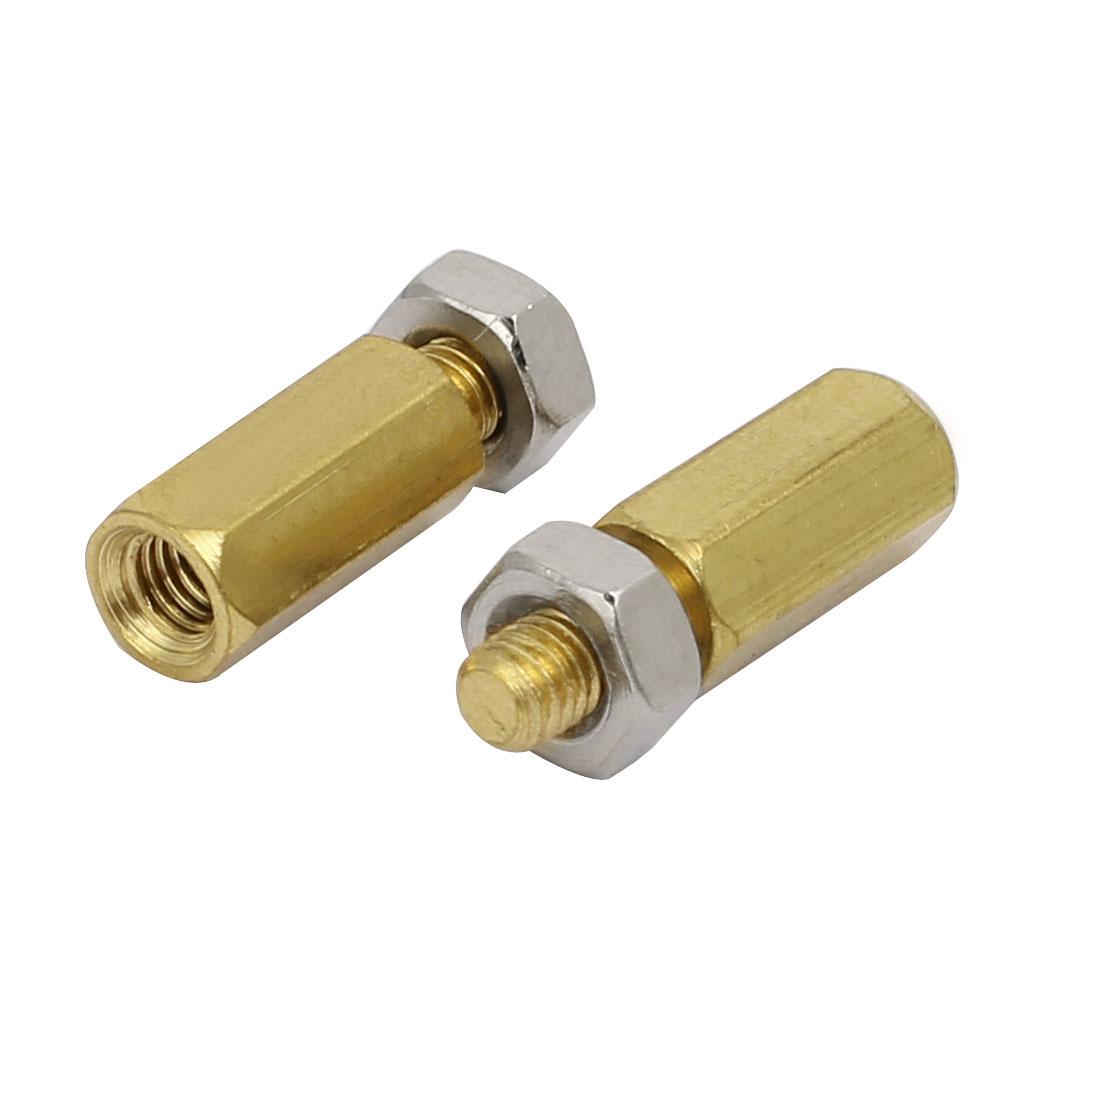 50Pcs M3 Male to Female Thread Copper Pillar Standoff Hexagonal Spacer w Nuts - image 1 de 3